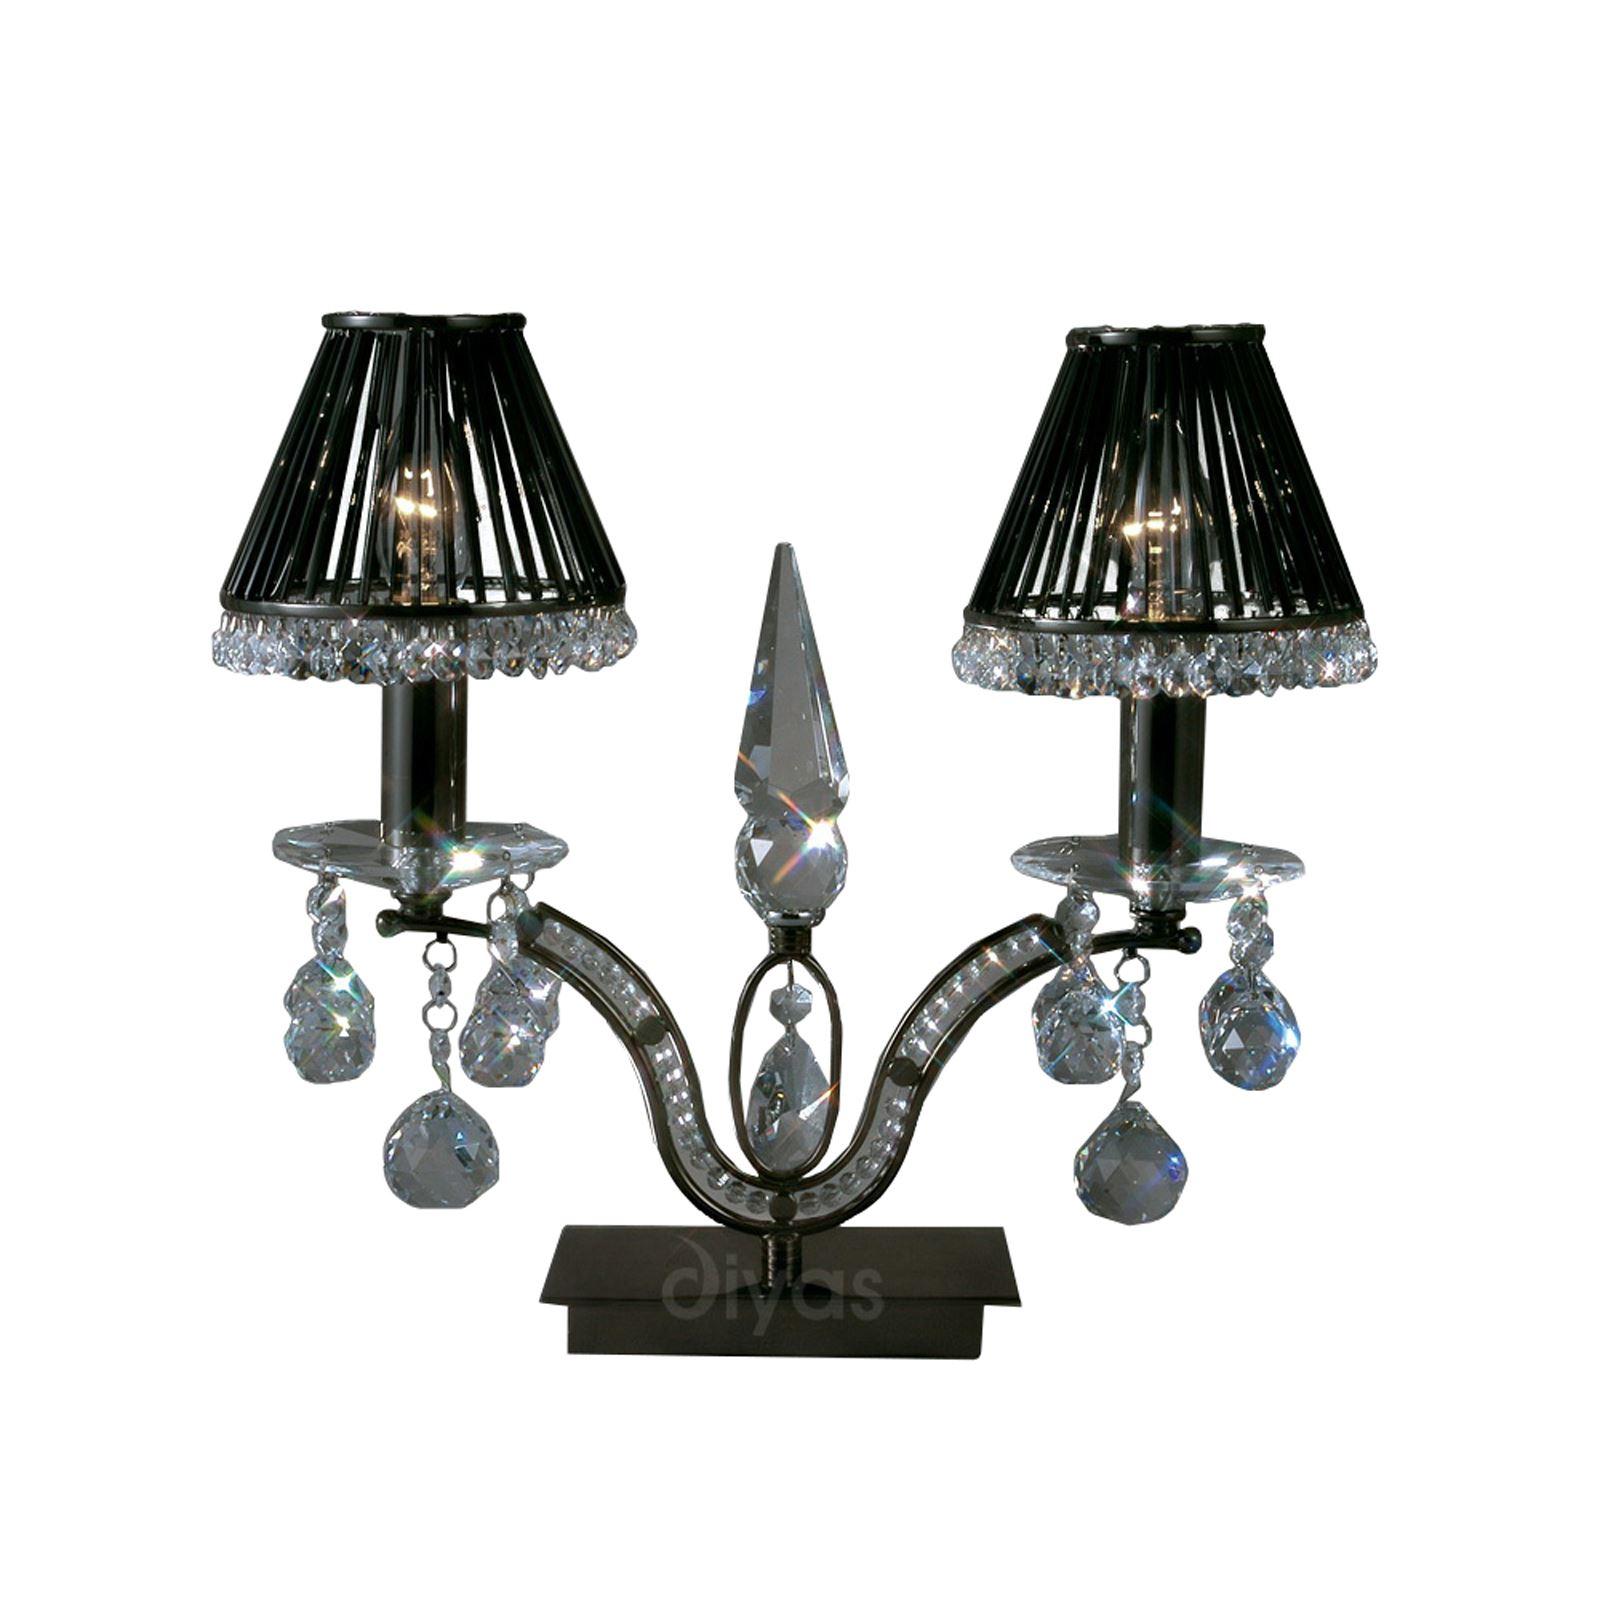 Modern Stylish Table Lamp 2 Light Black Chrome/Crystal - High Quality